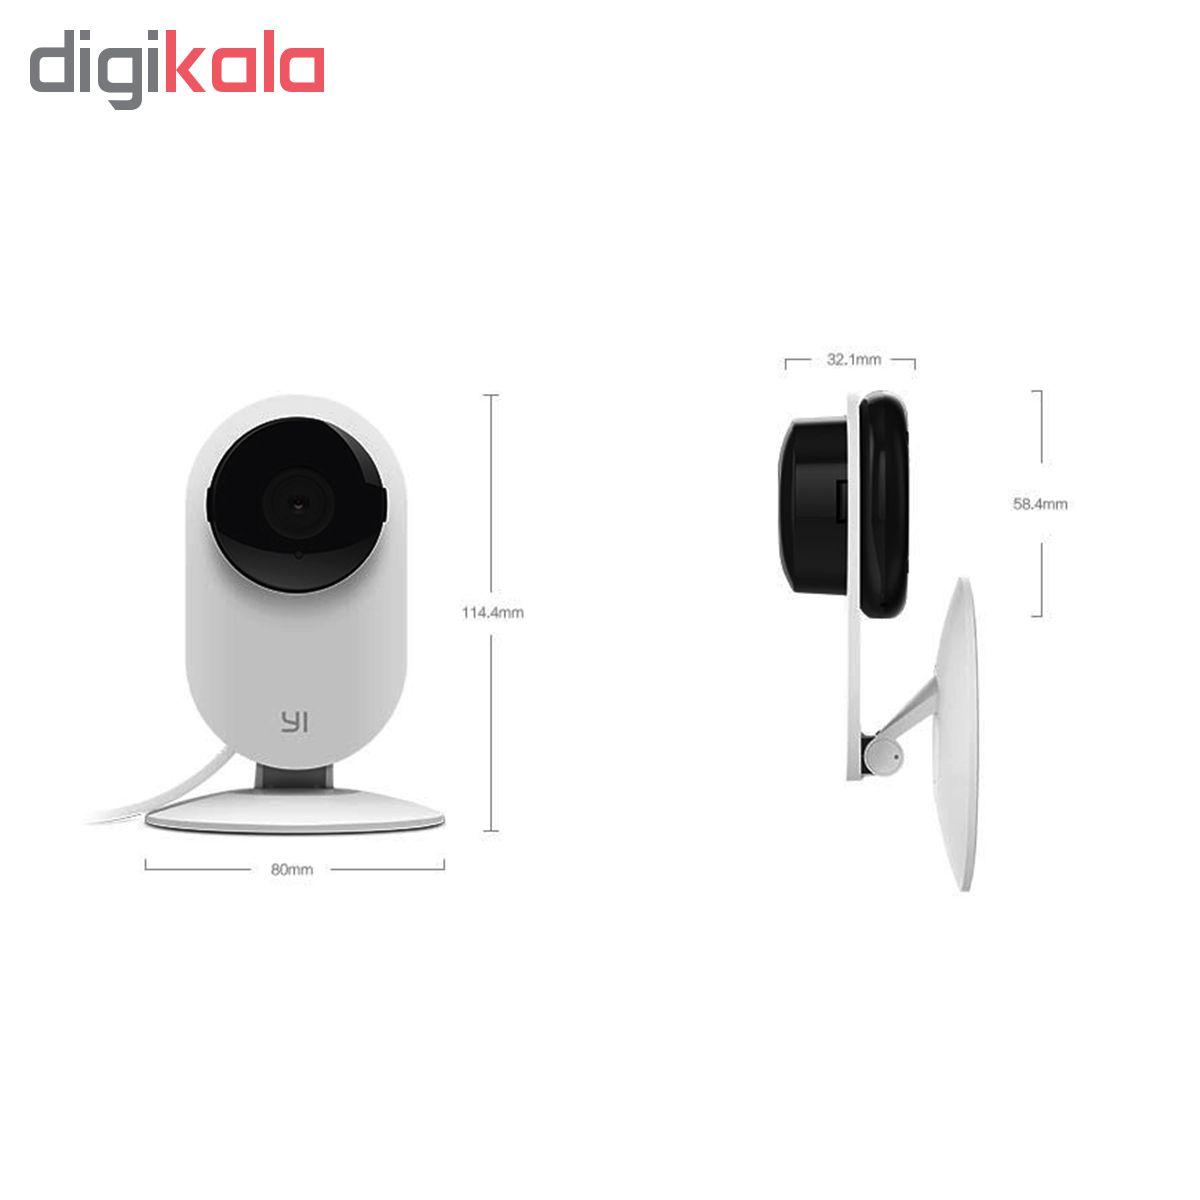 دوربین تحت شبکه شیائومی وای آی مدل 1080pگلوبال